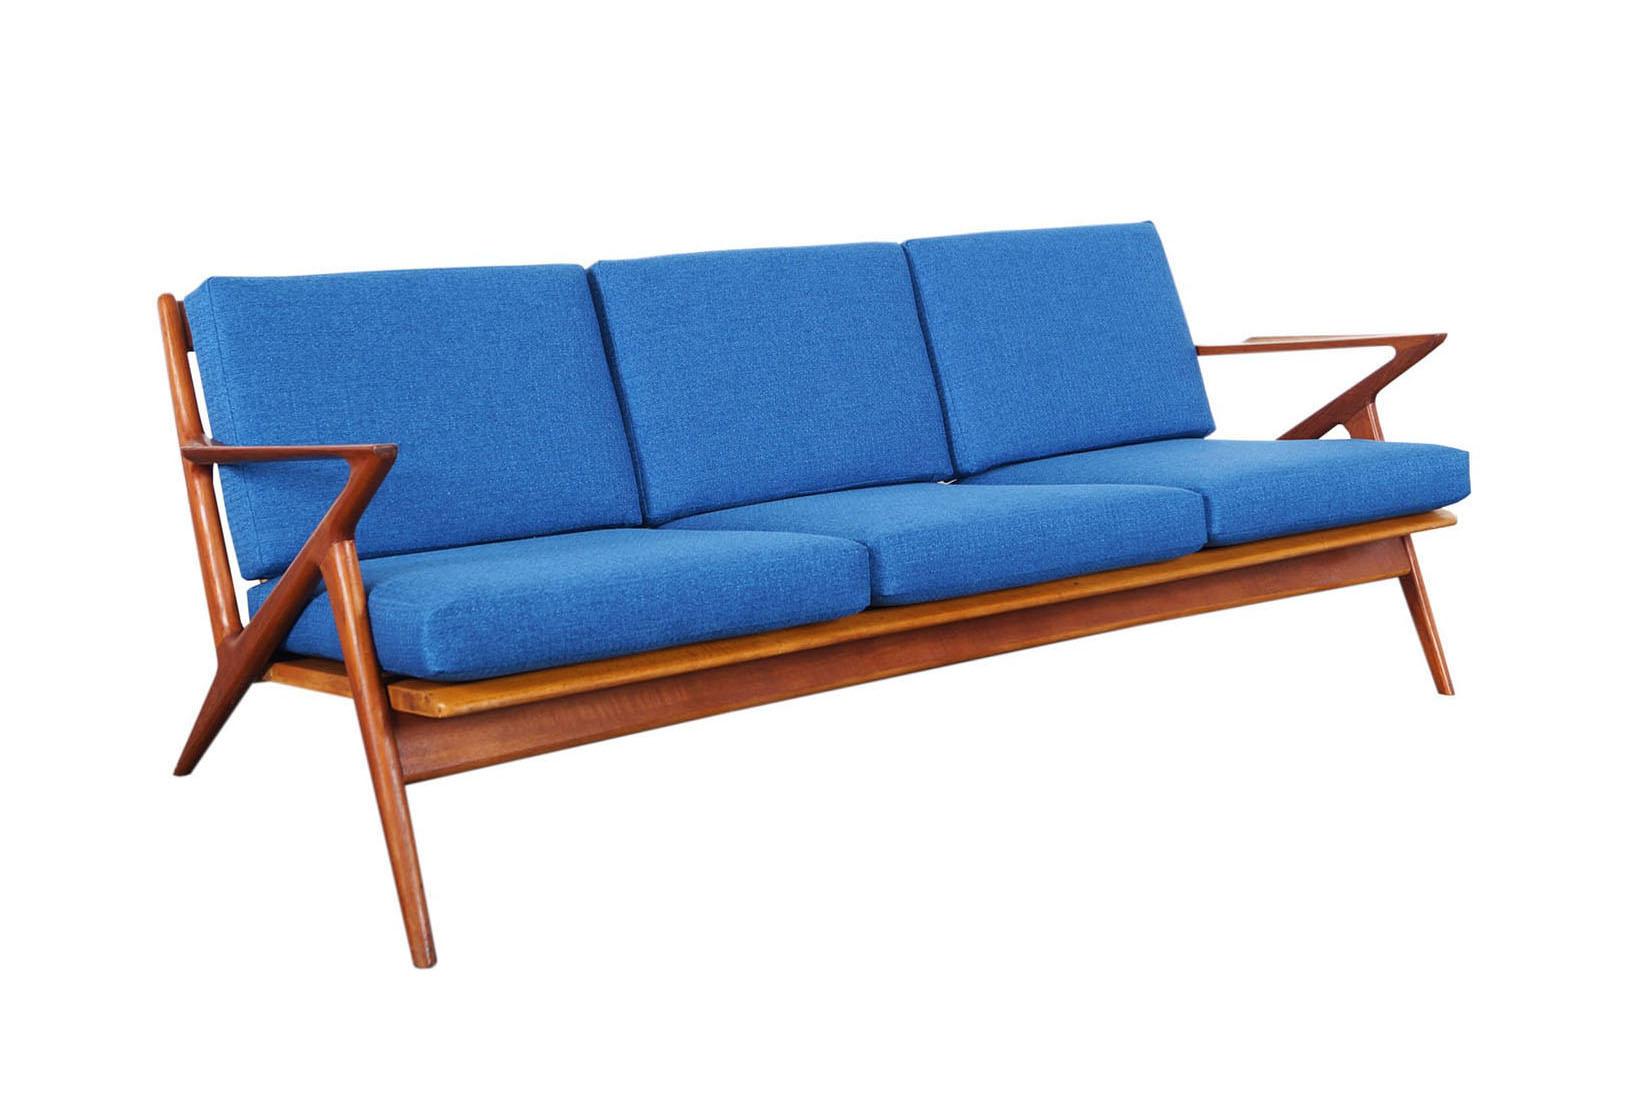 Danish Contemporary Sofas Furniture Danish Modern Daybed